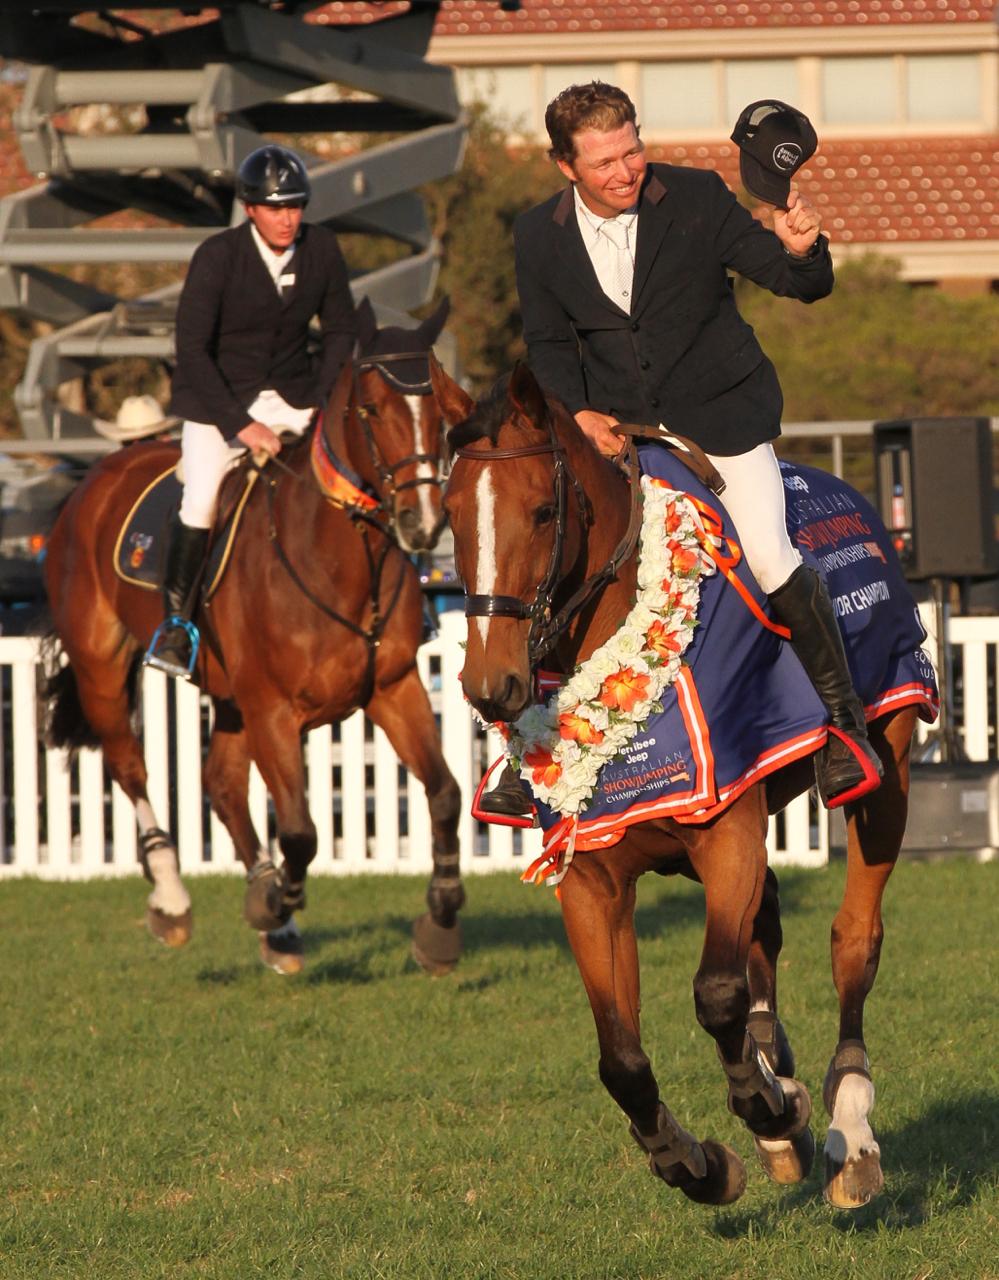 David Cameron - 2x Australian Champion 2014 & 2015World Cup Rider